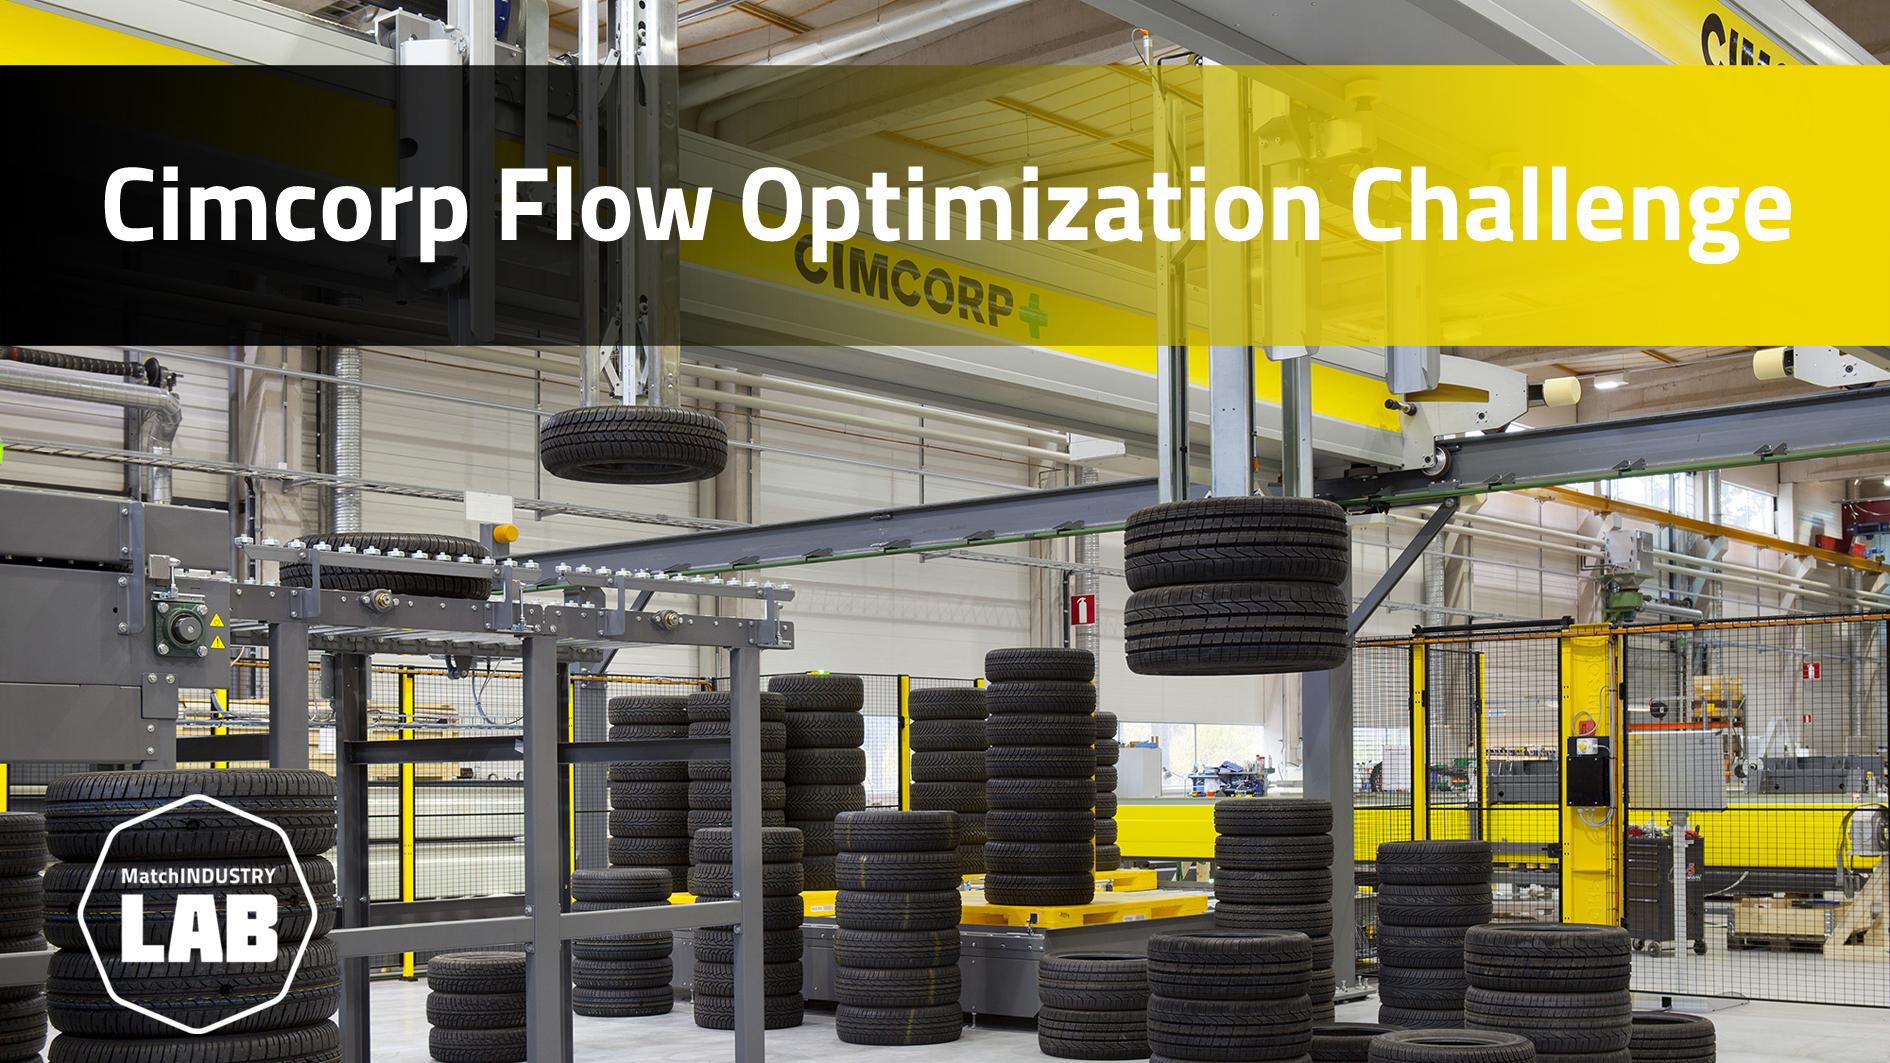 Cimcorp Flow Optimization Challenge